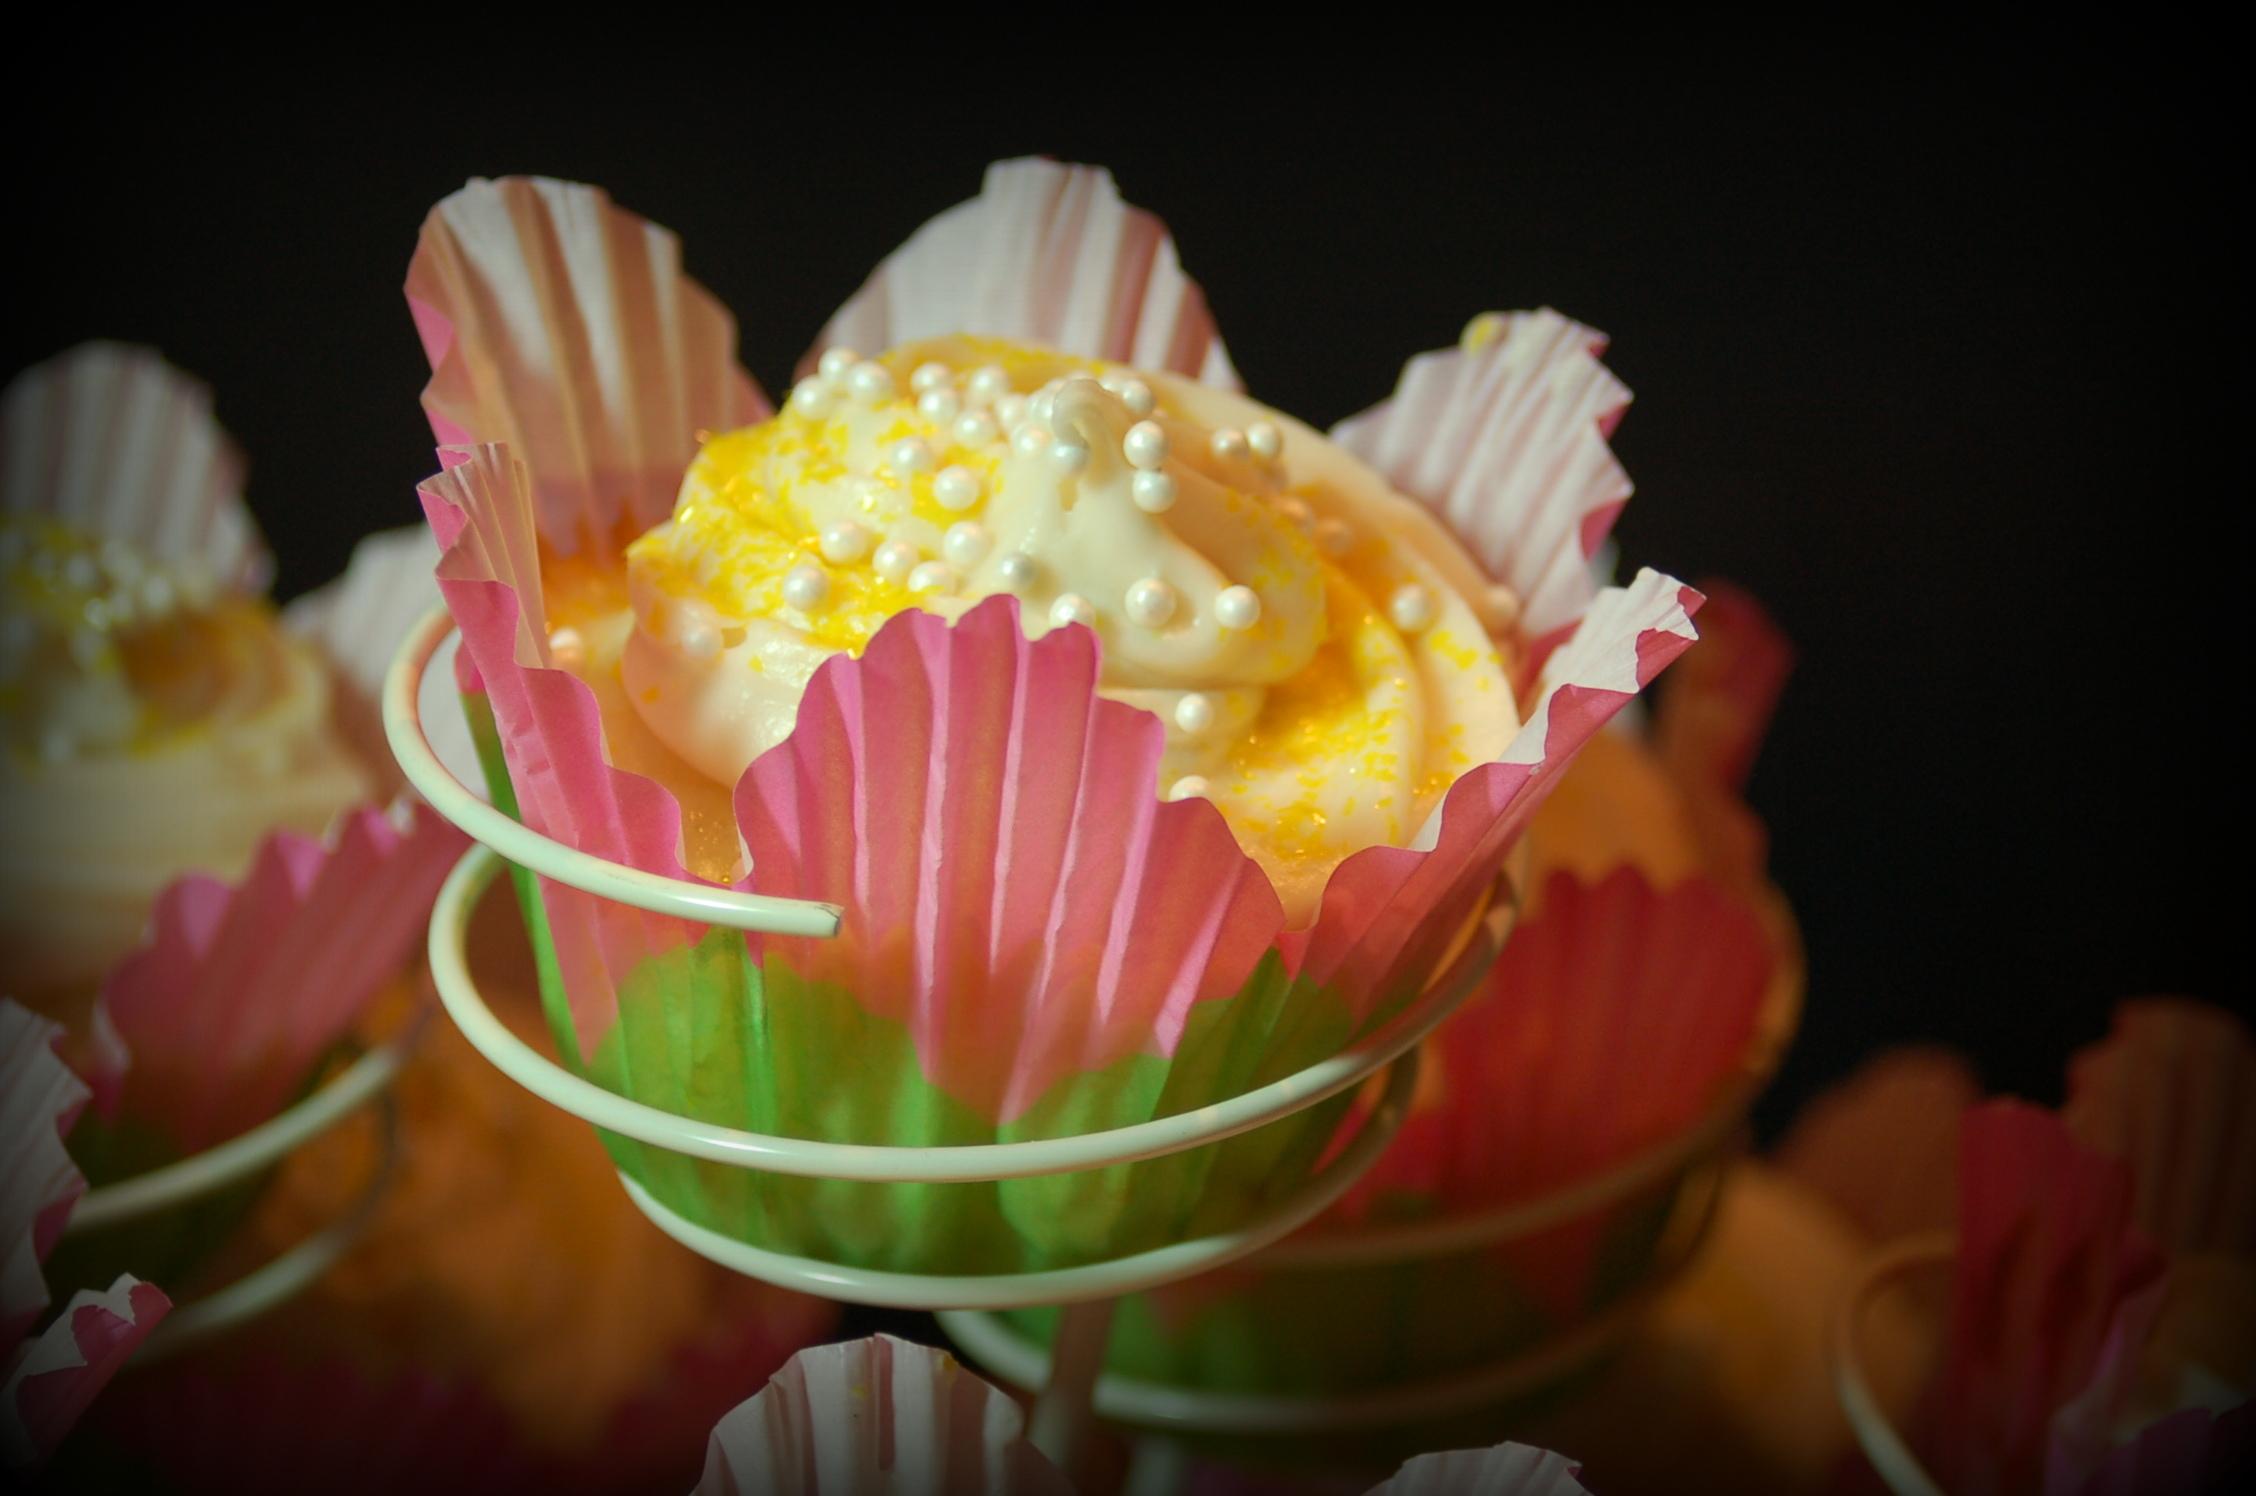 Lemon Cream Cupcakes - Pink Polka Dot Creations